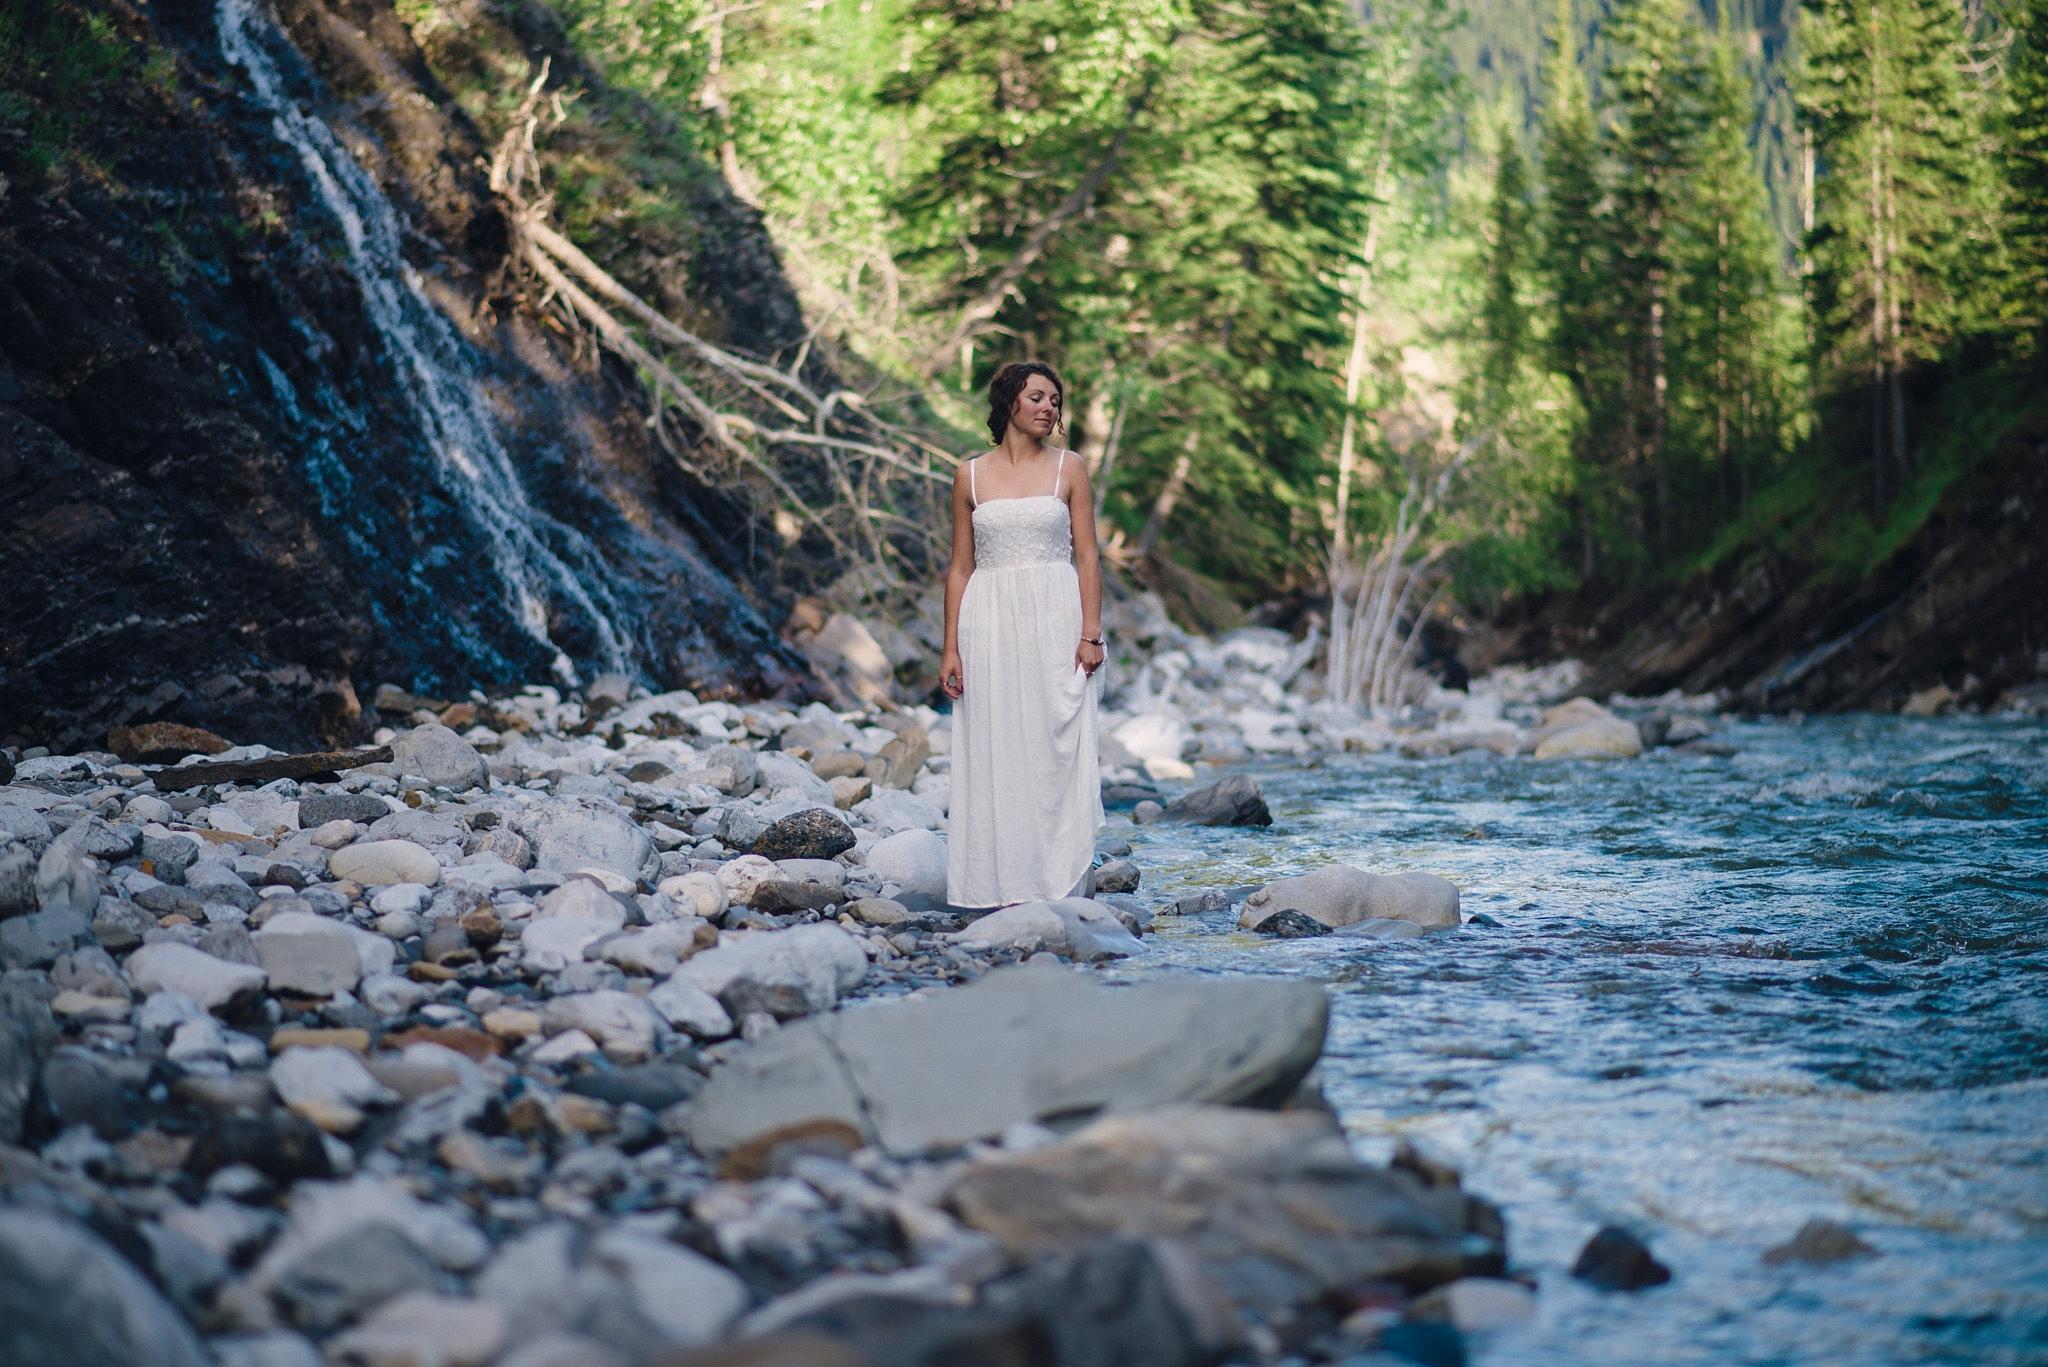 kaihla_tonai_intimate_wedding_elopement_photographer_1015